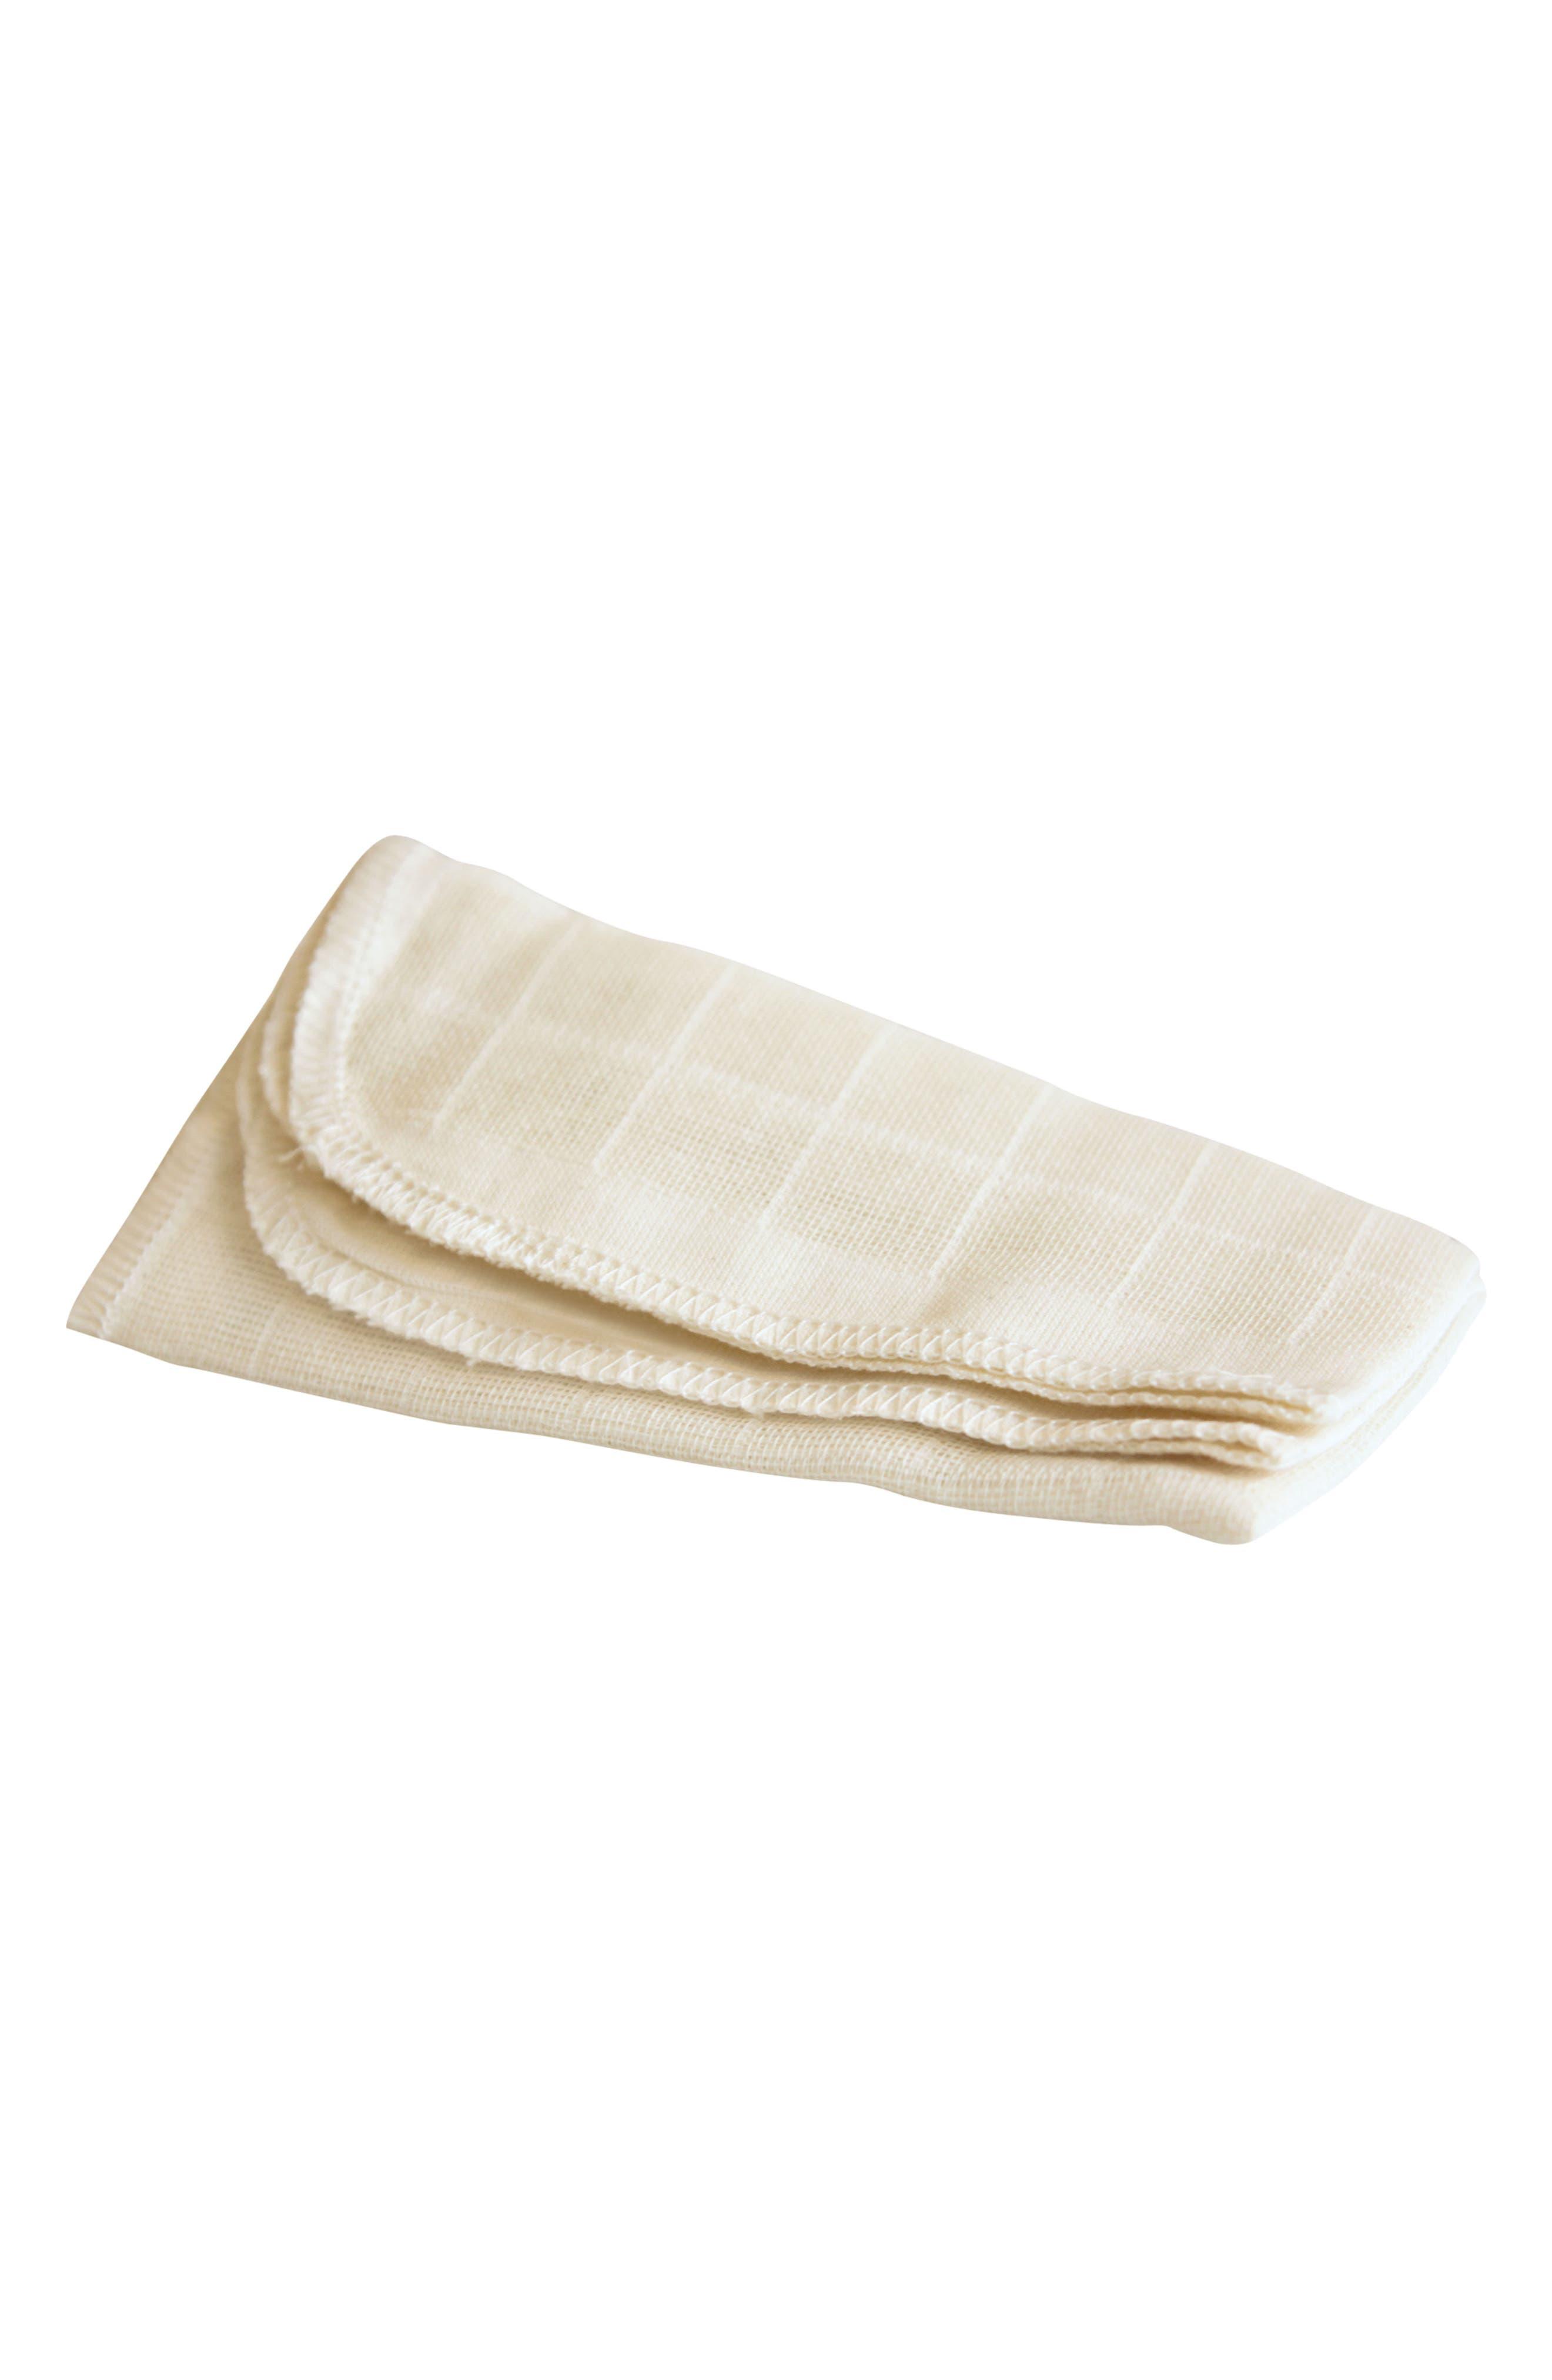 Muslin Cloth,                         Main,                         color, 000